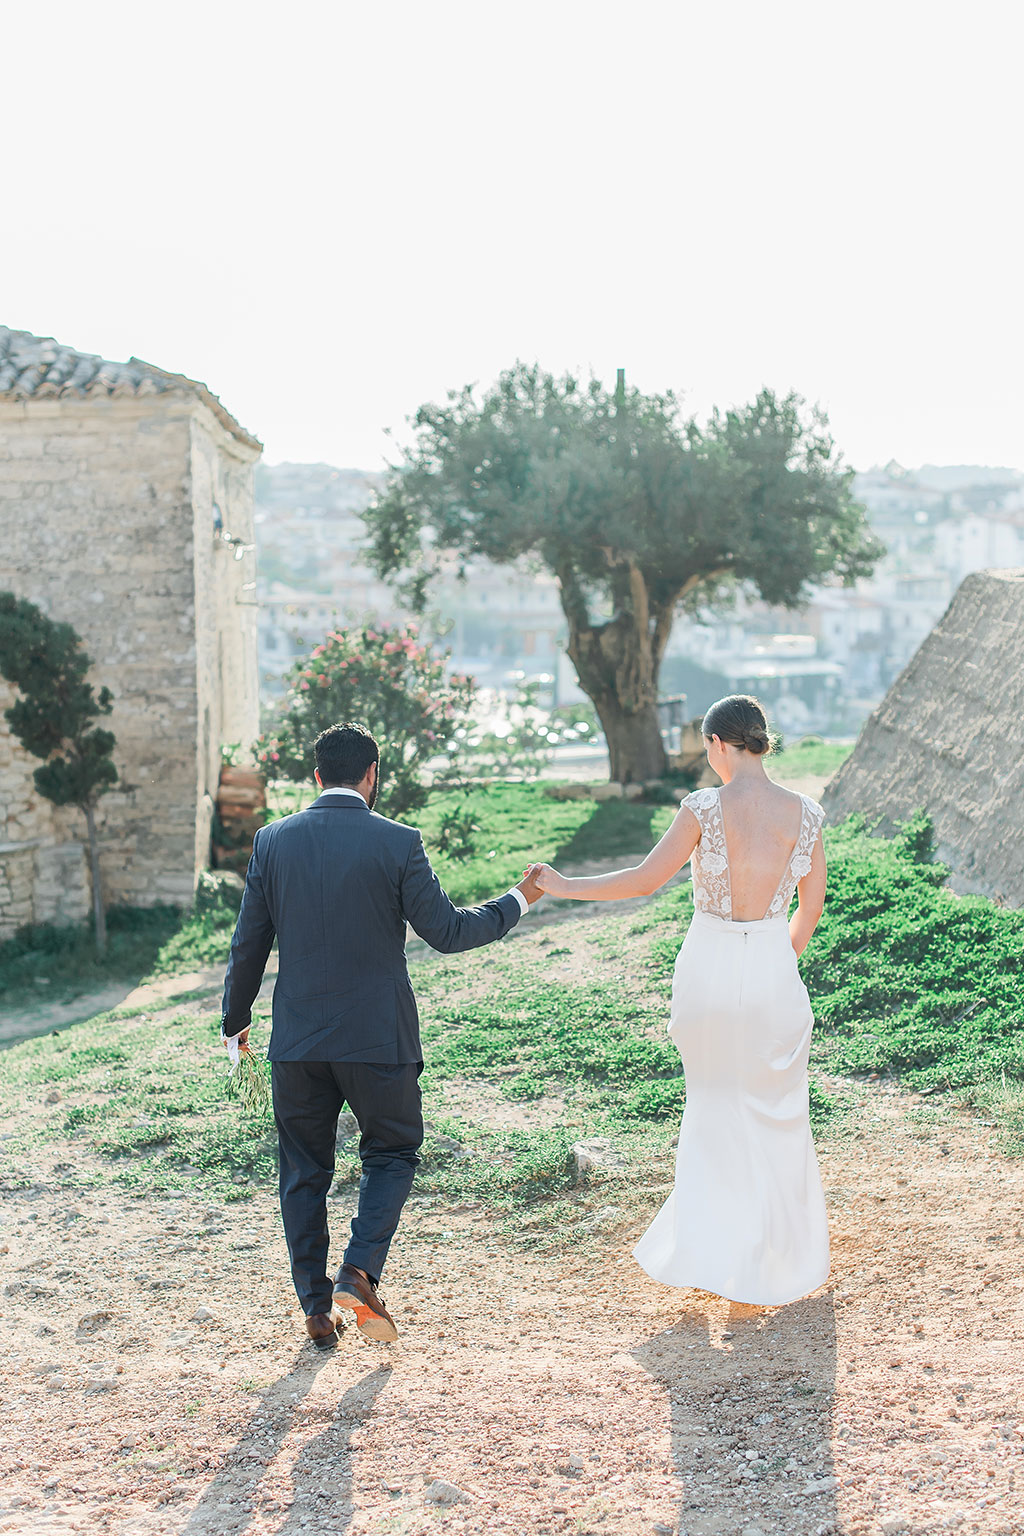 Bride and groom walking to take a pose, γαμήλια φωτογραφία στην Χαλκιδική